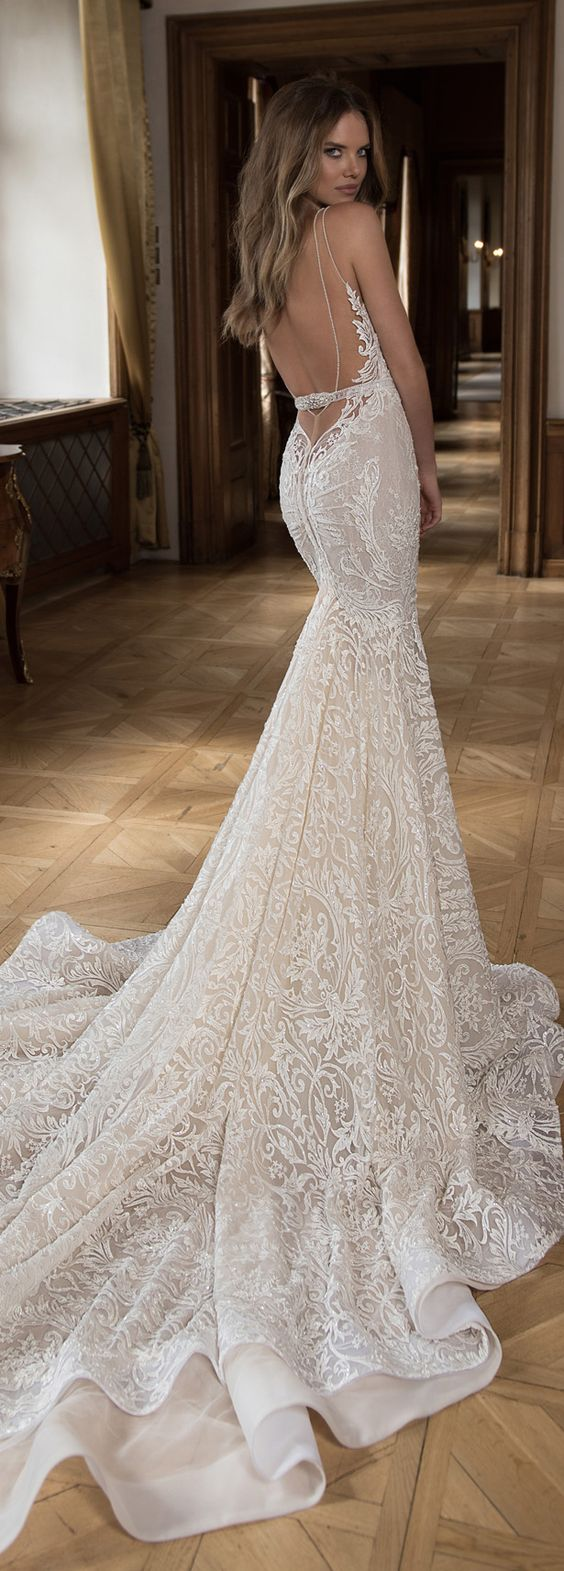 Belle Wedding And Wedding Invitation Sets On Pinterest